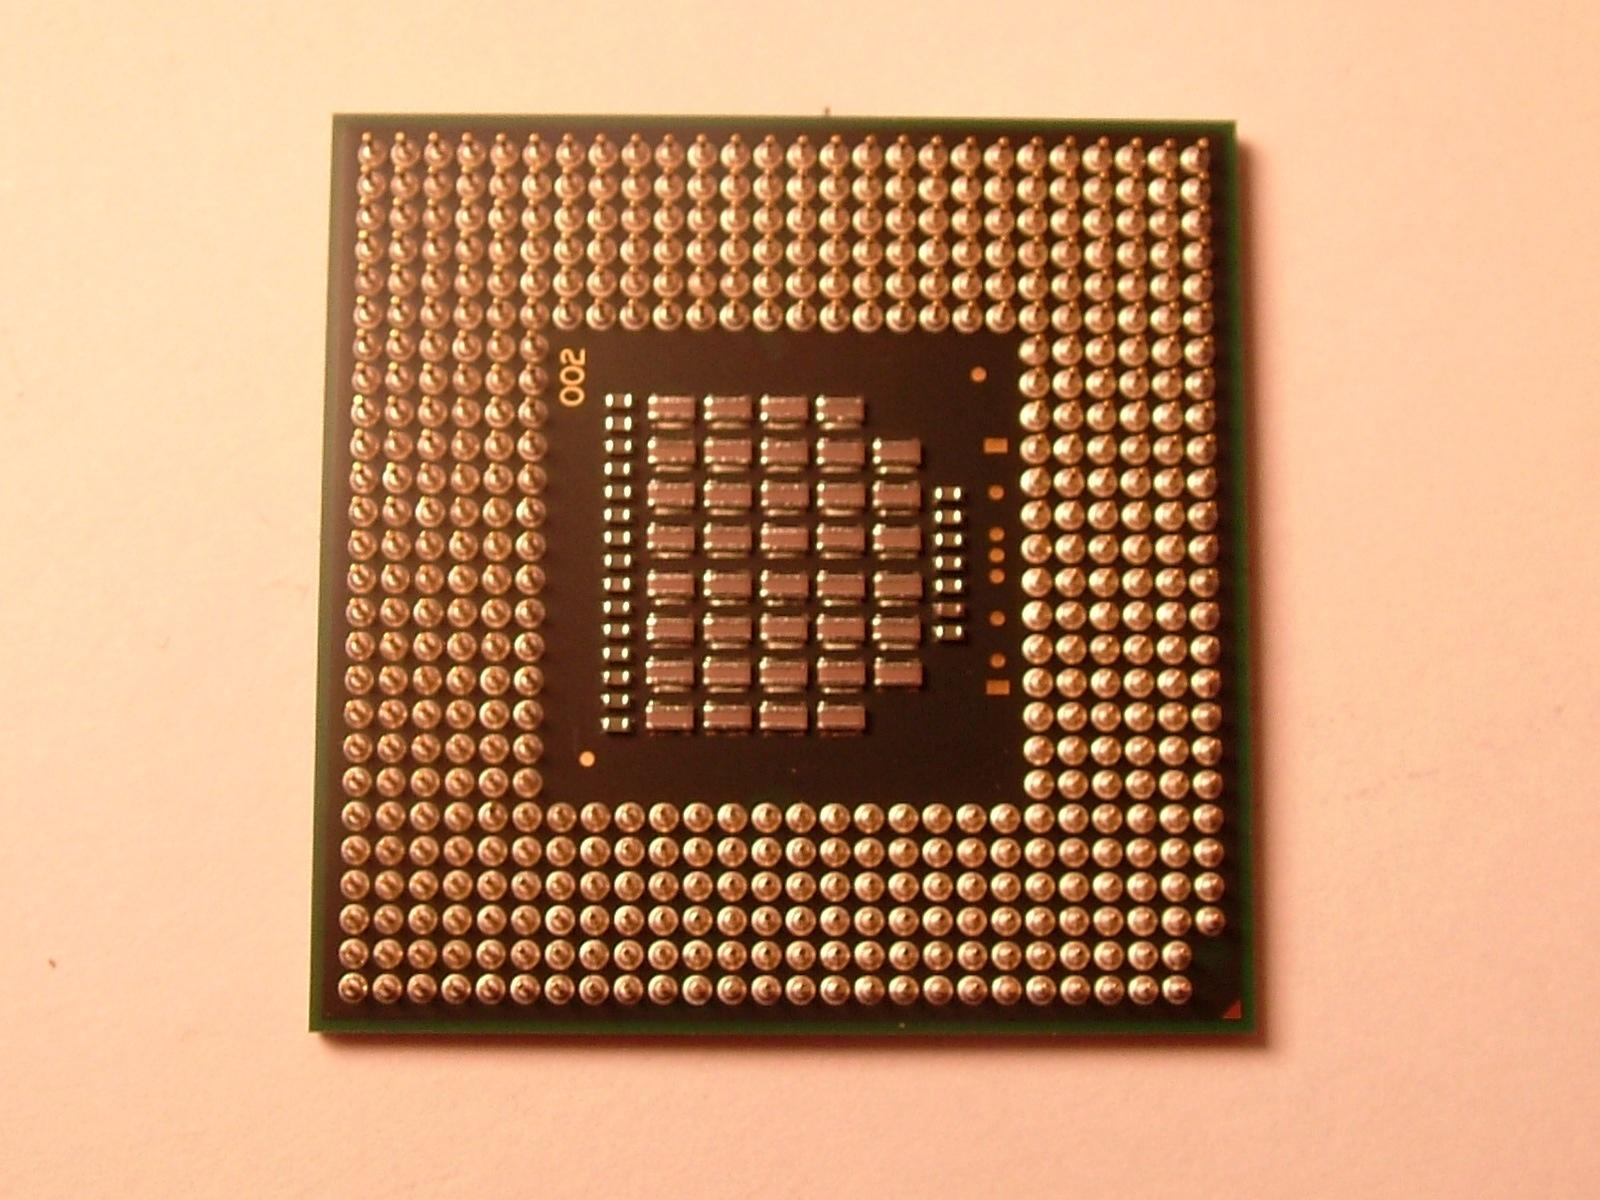 INTEL CORE DUO CPU T2350 WINDOWS 7 X64 DRIVER DOWNLOAD